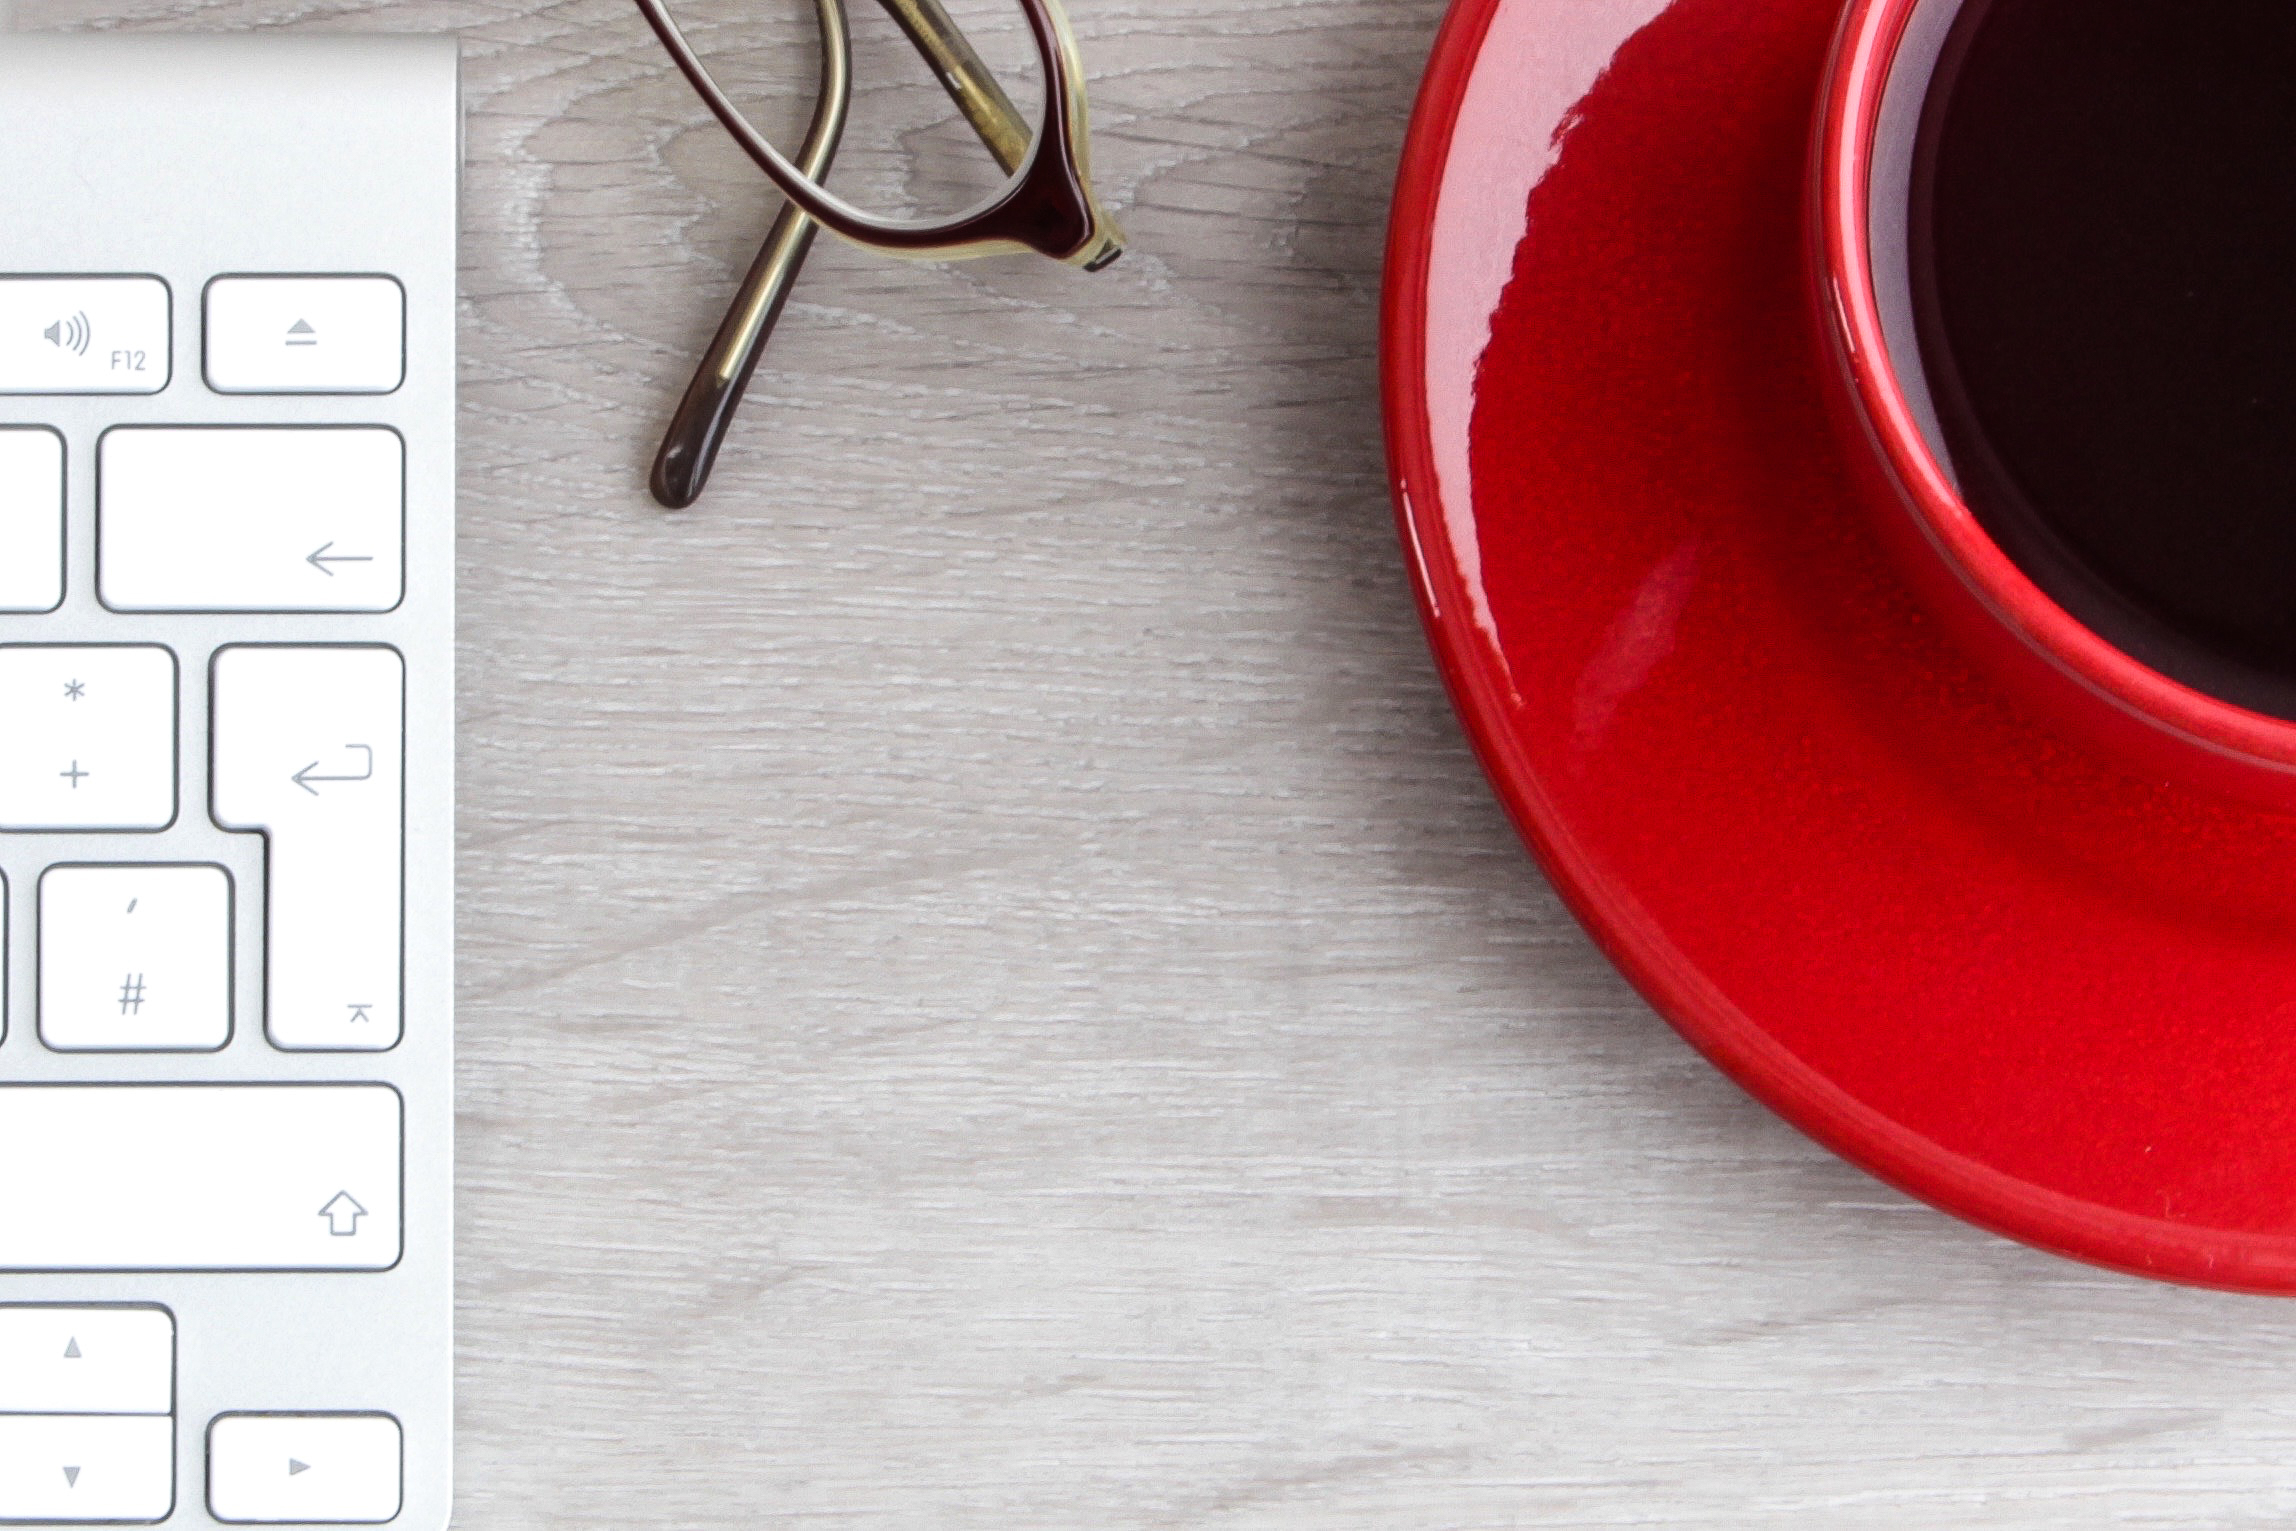 desk, cup, coffee, glasses, keyboard